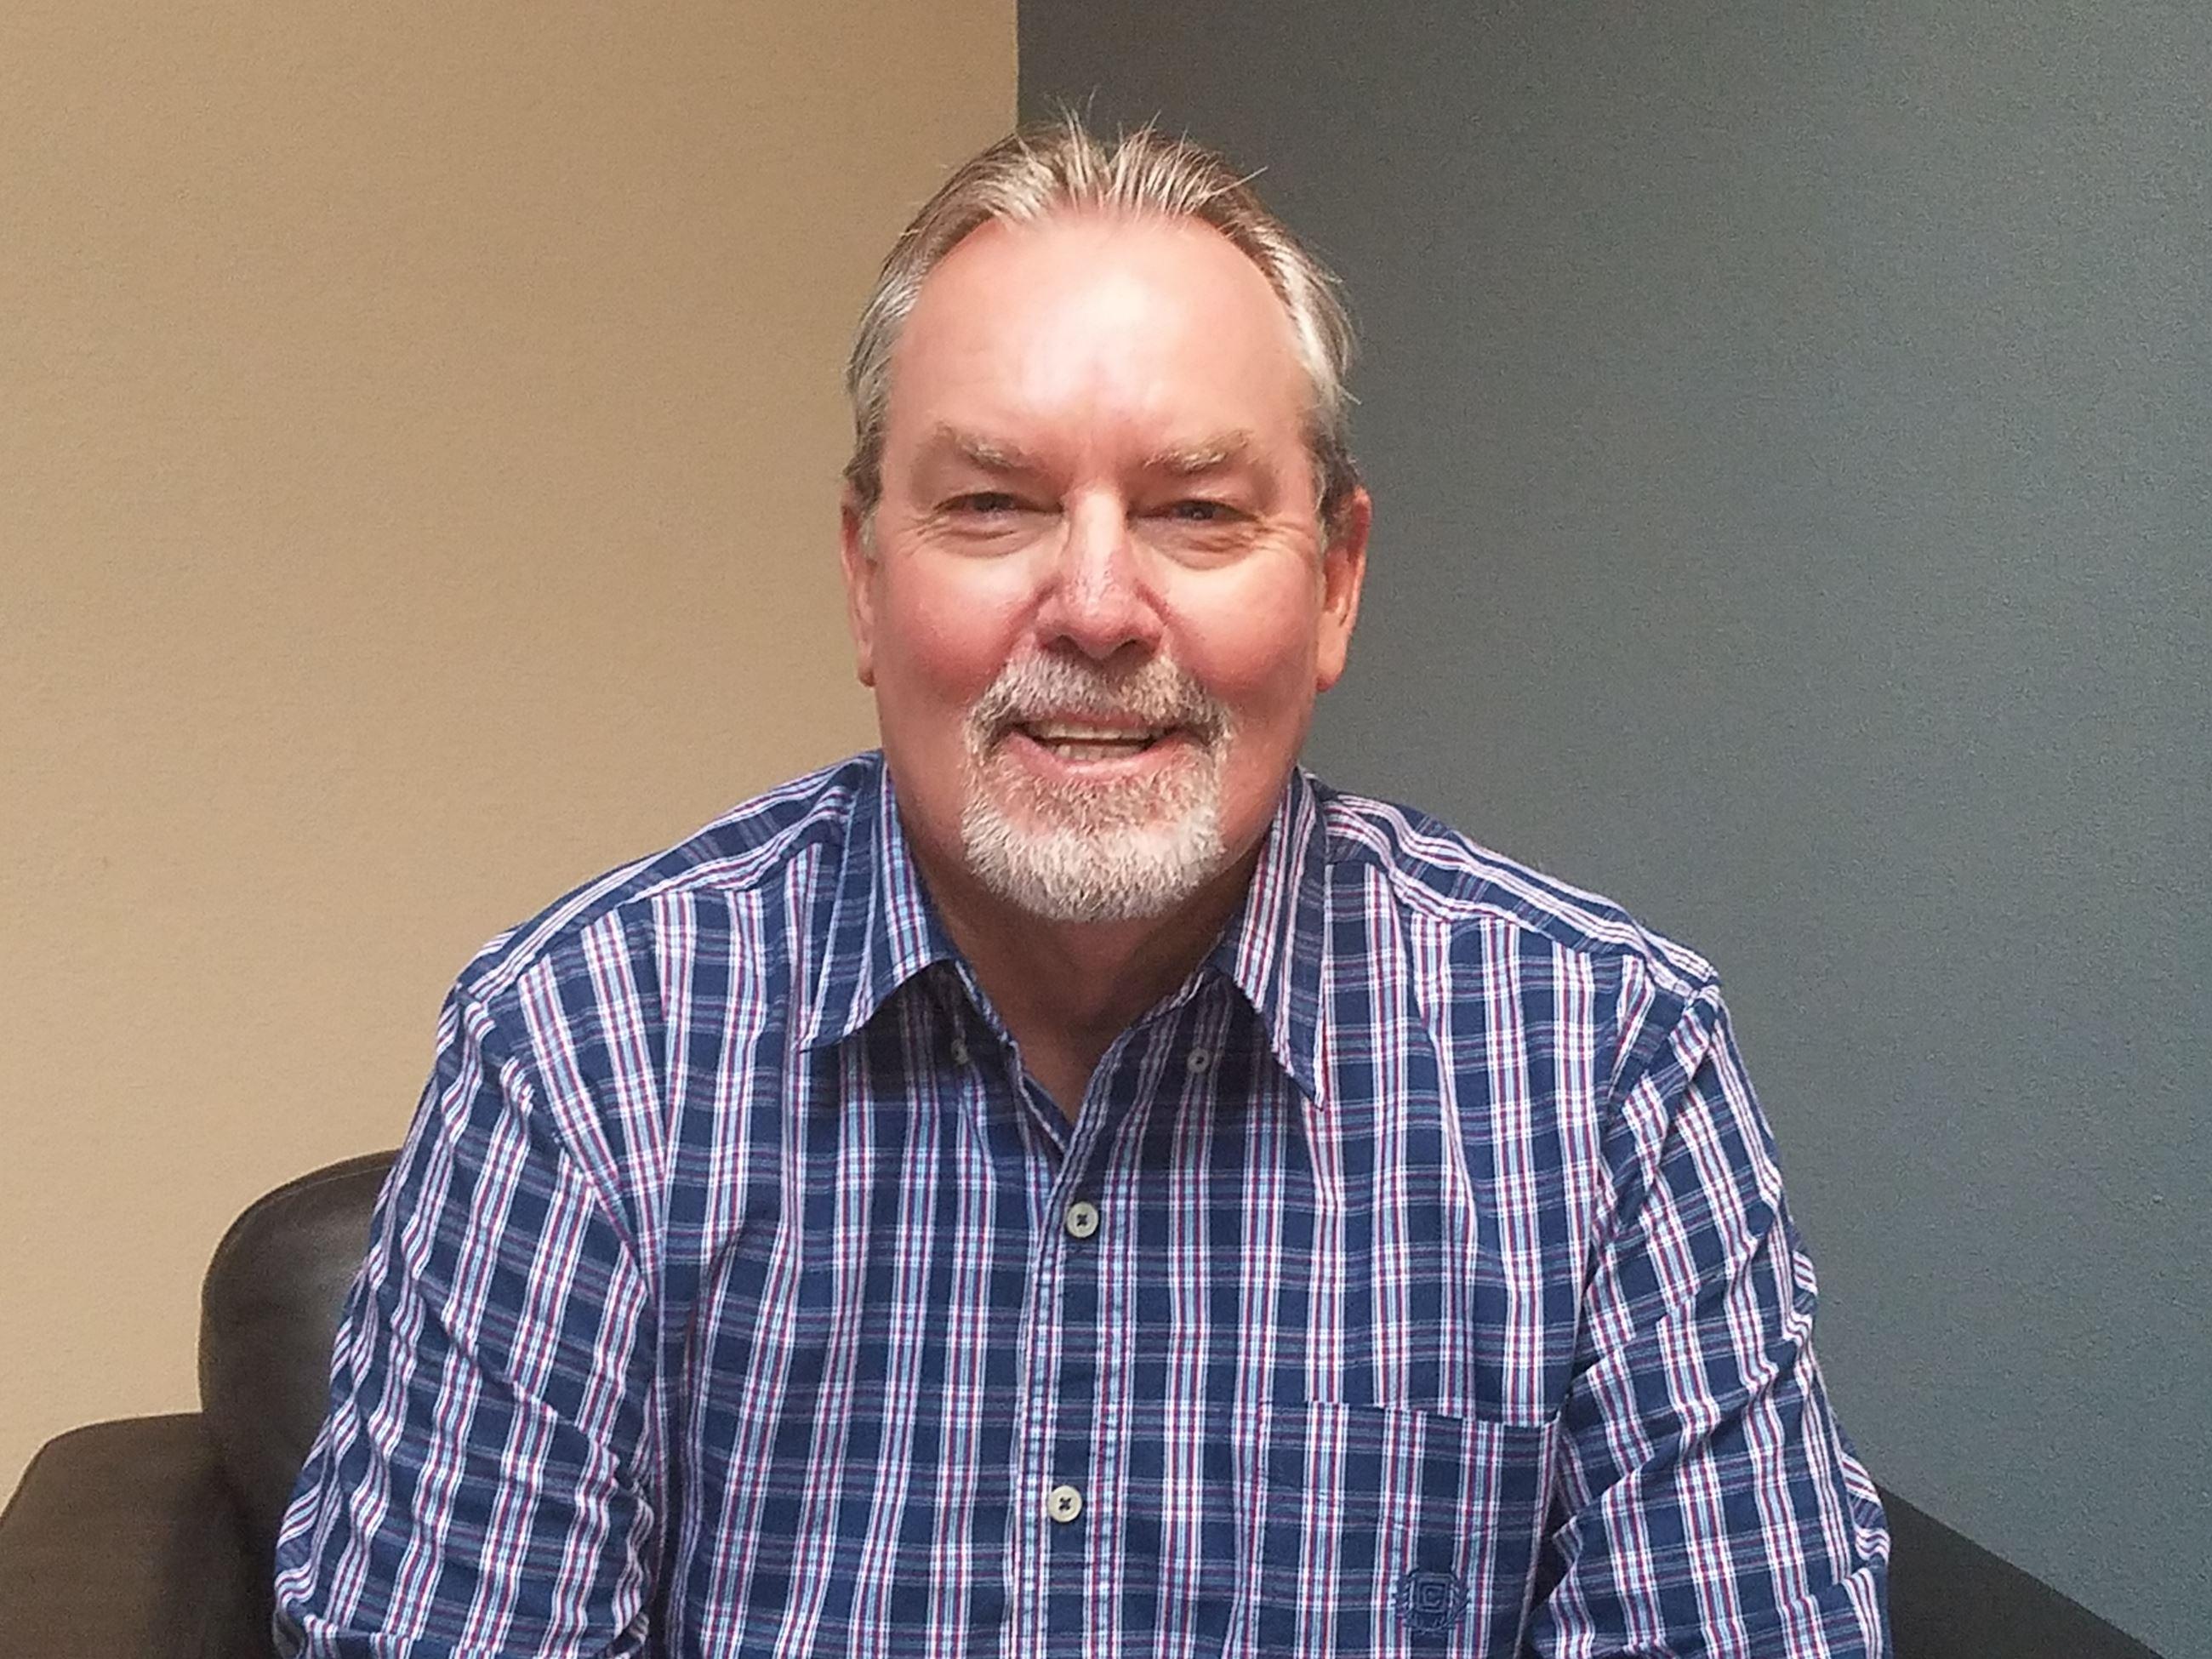 Dennis Bowman, Superintendent